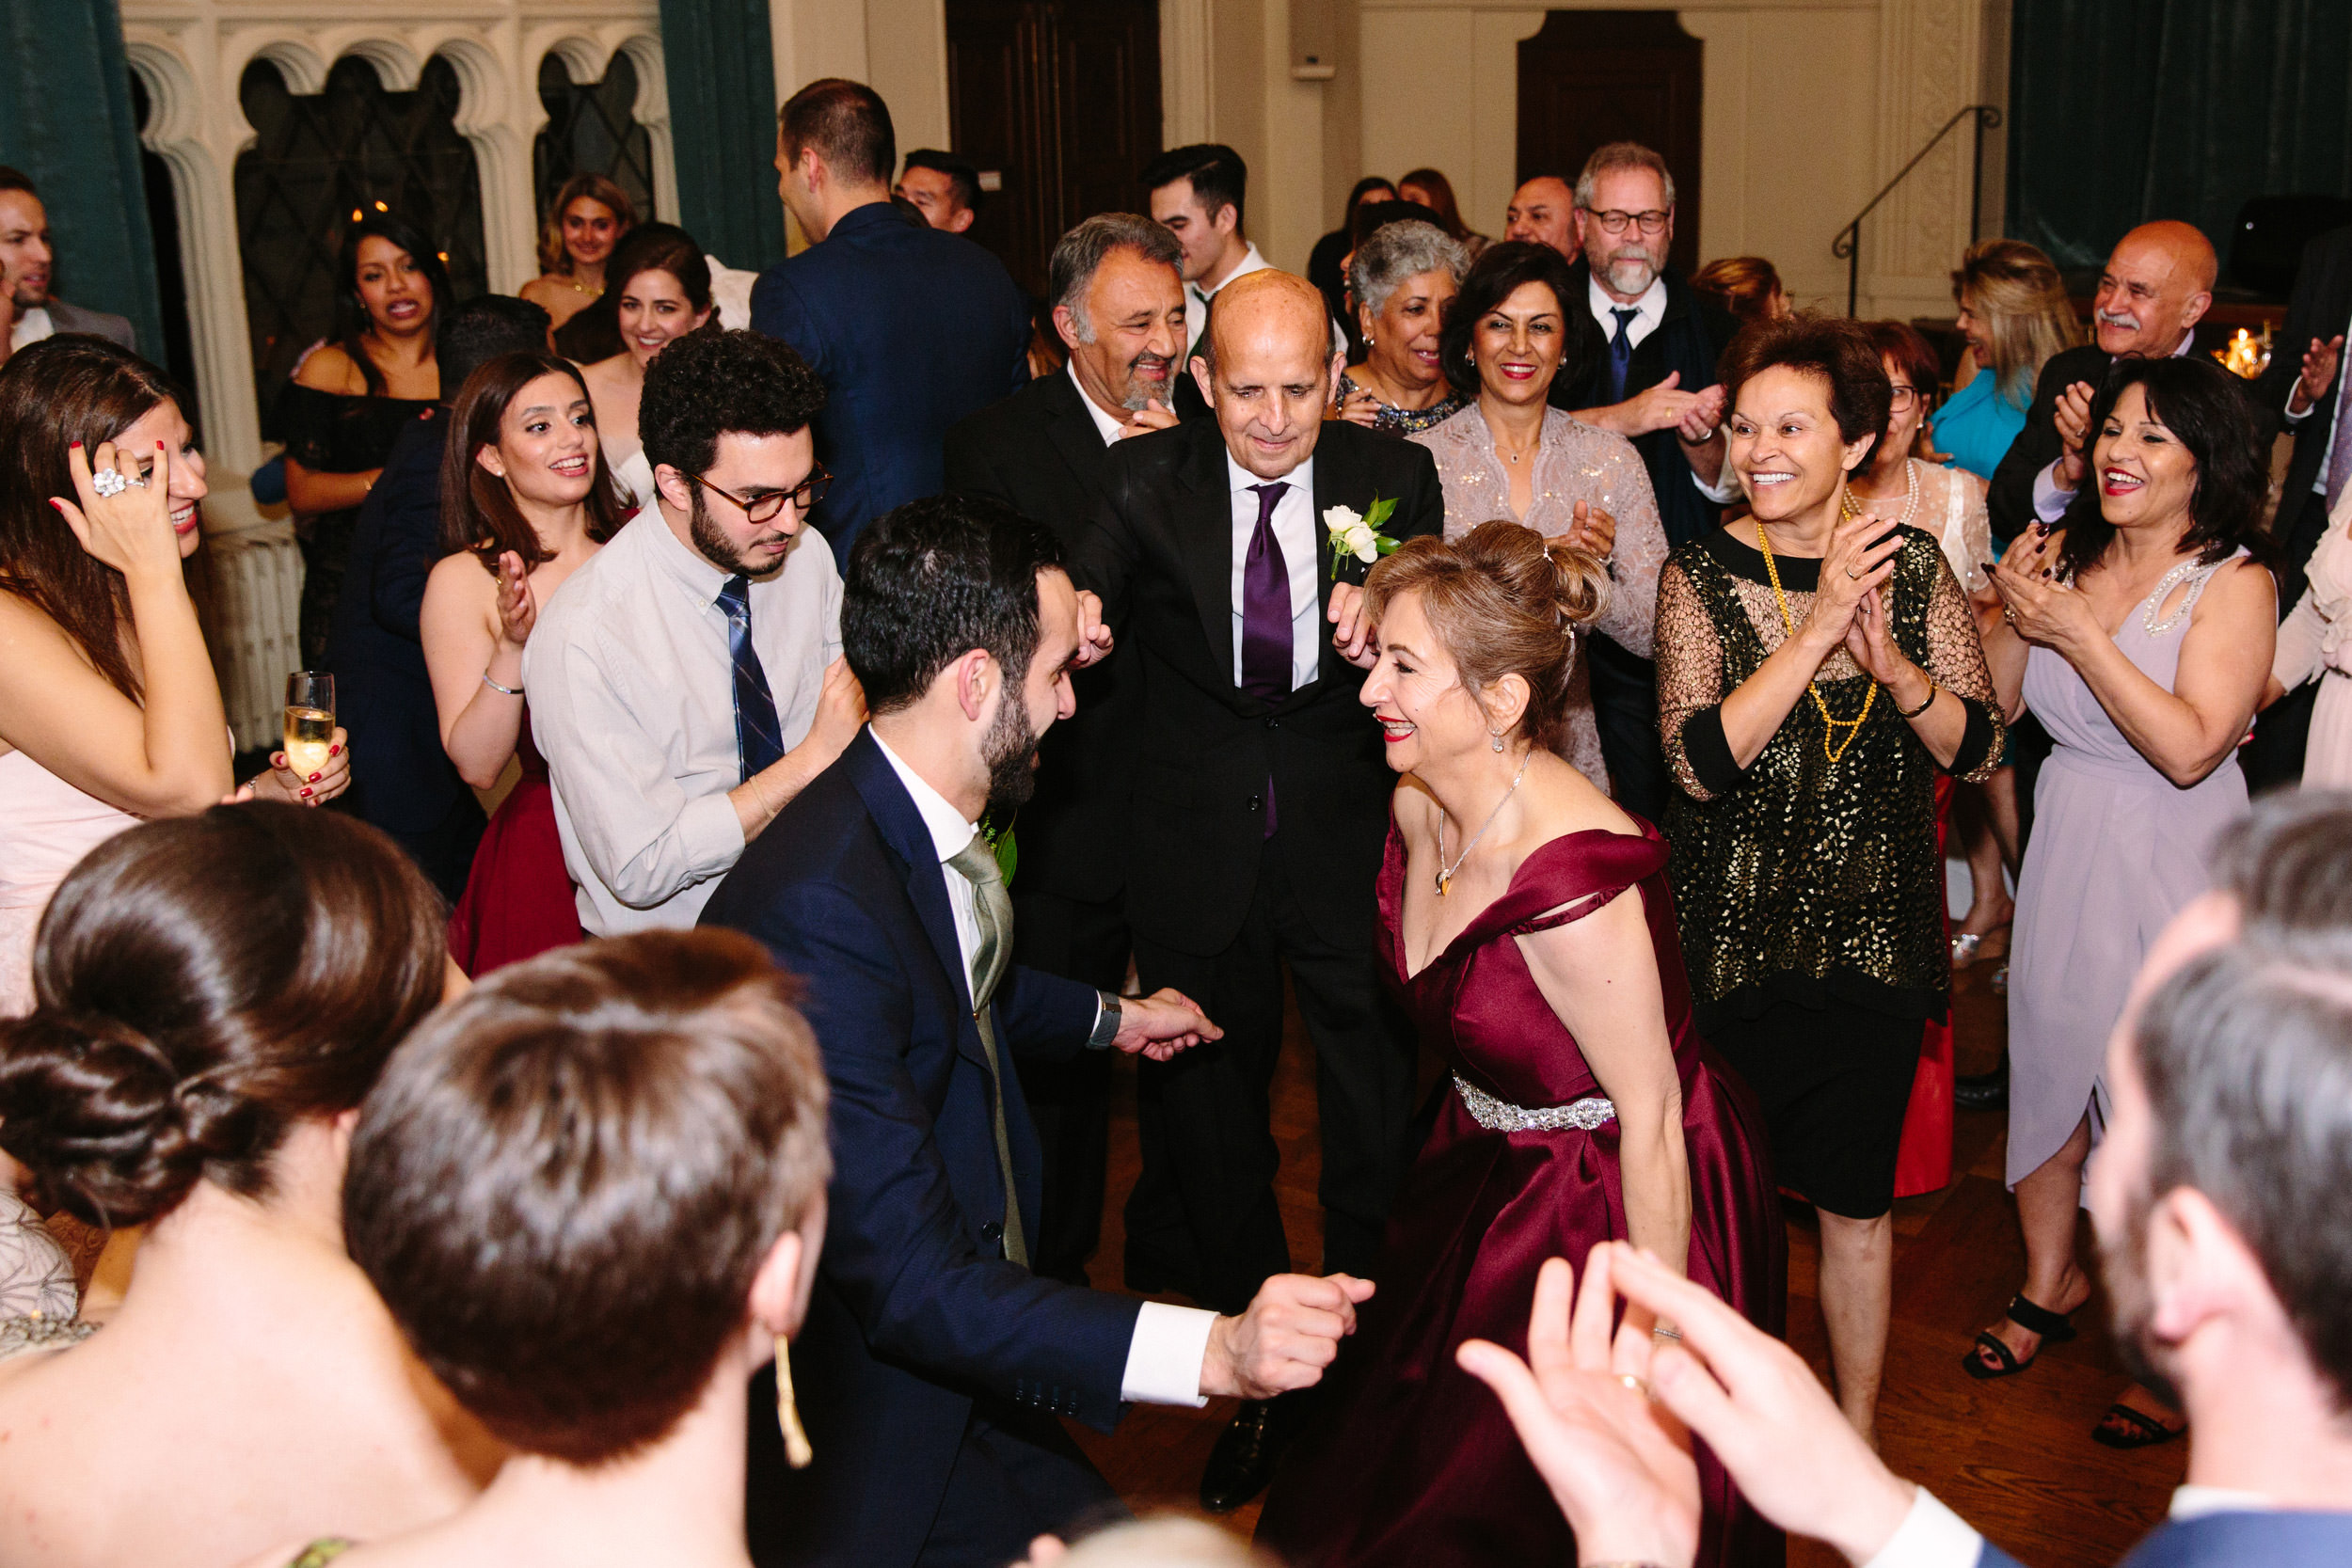 Berkeley_city_club_wedding_64.jpg